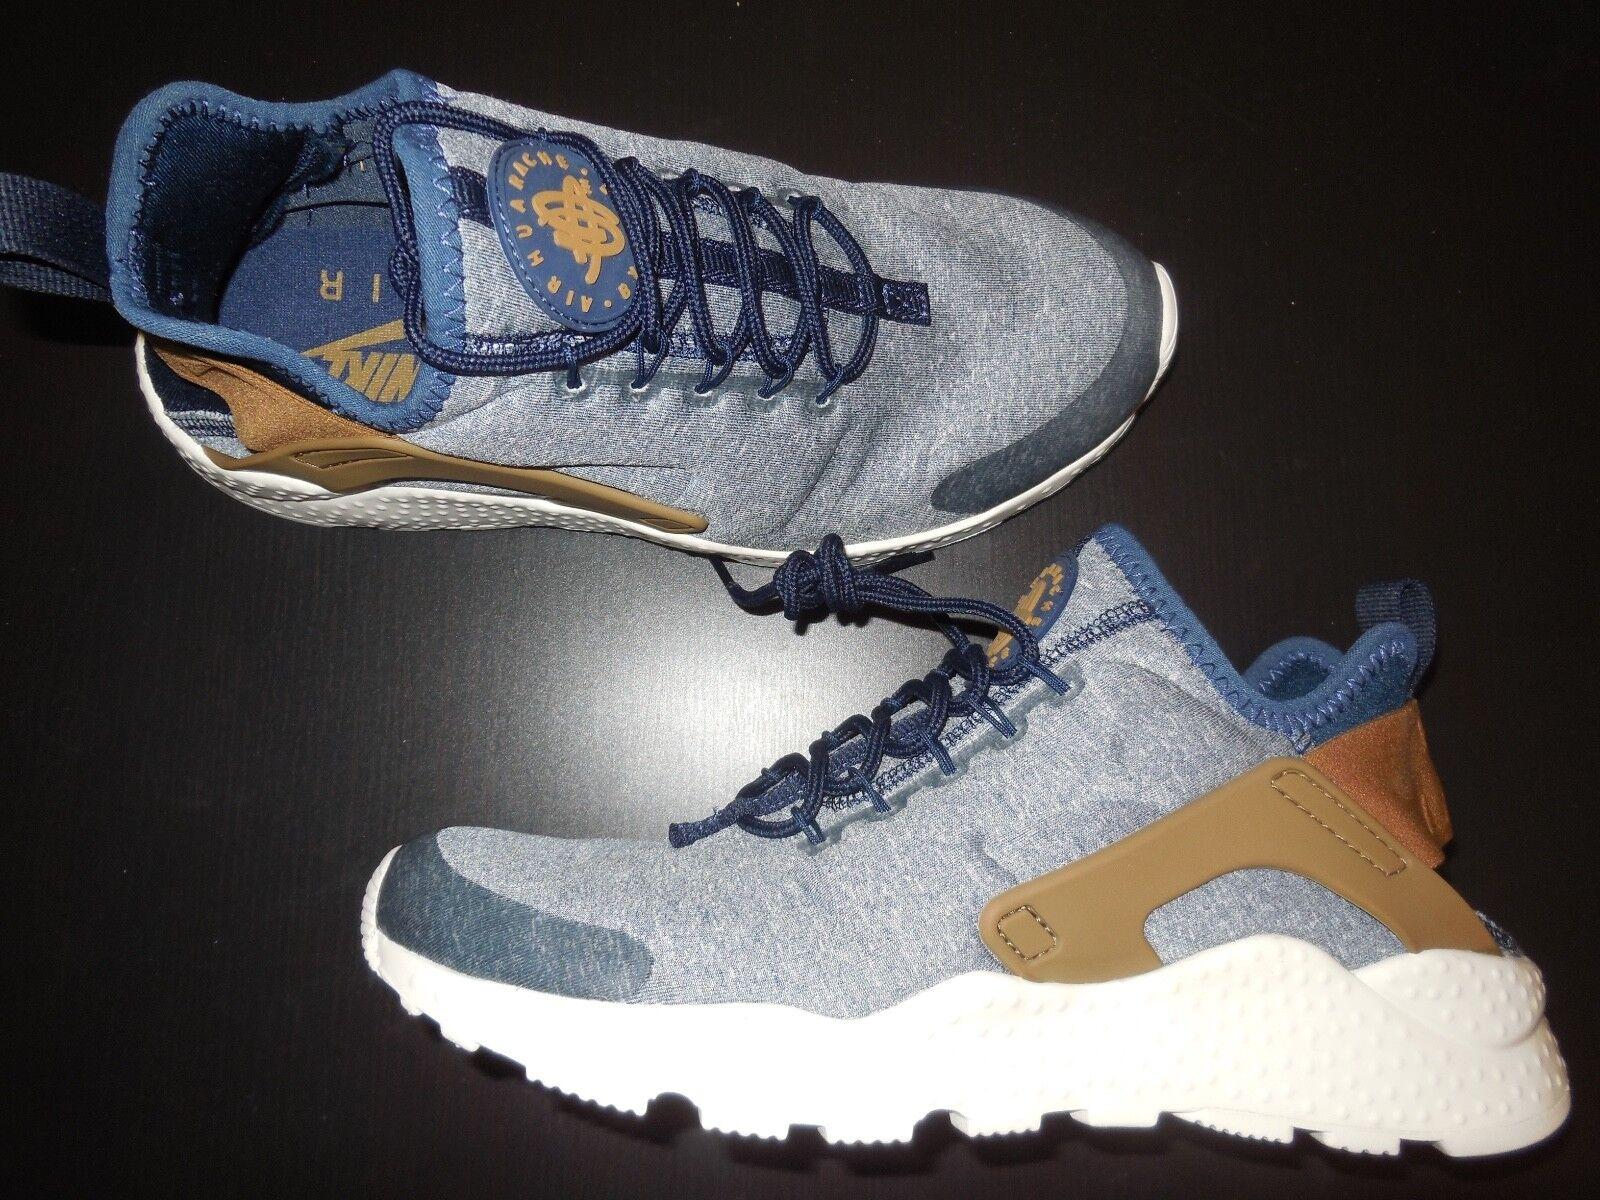 online store 7eca9 c68ea mujer Nike Air huarache Run Ultra se zapatos - Navy Nueva - stylesz 7 -  Nueva Navy c714a0